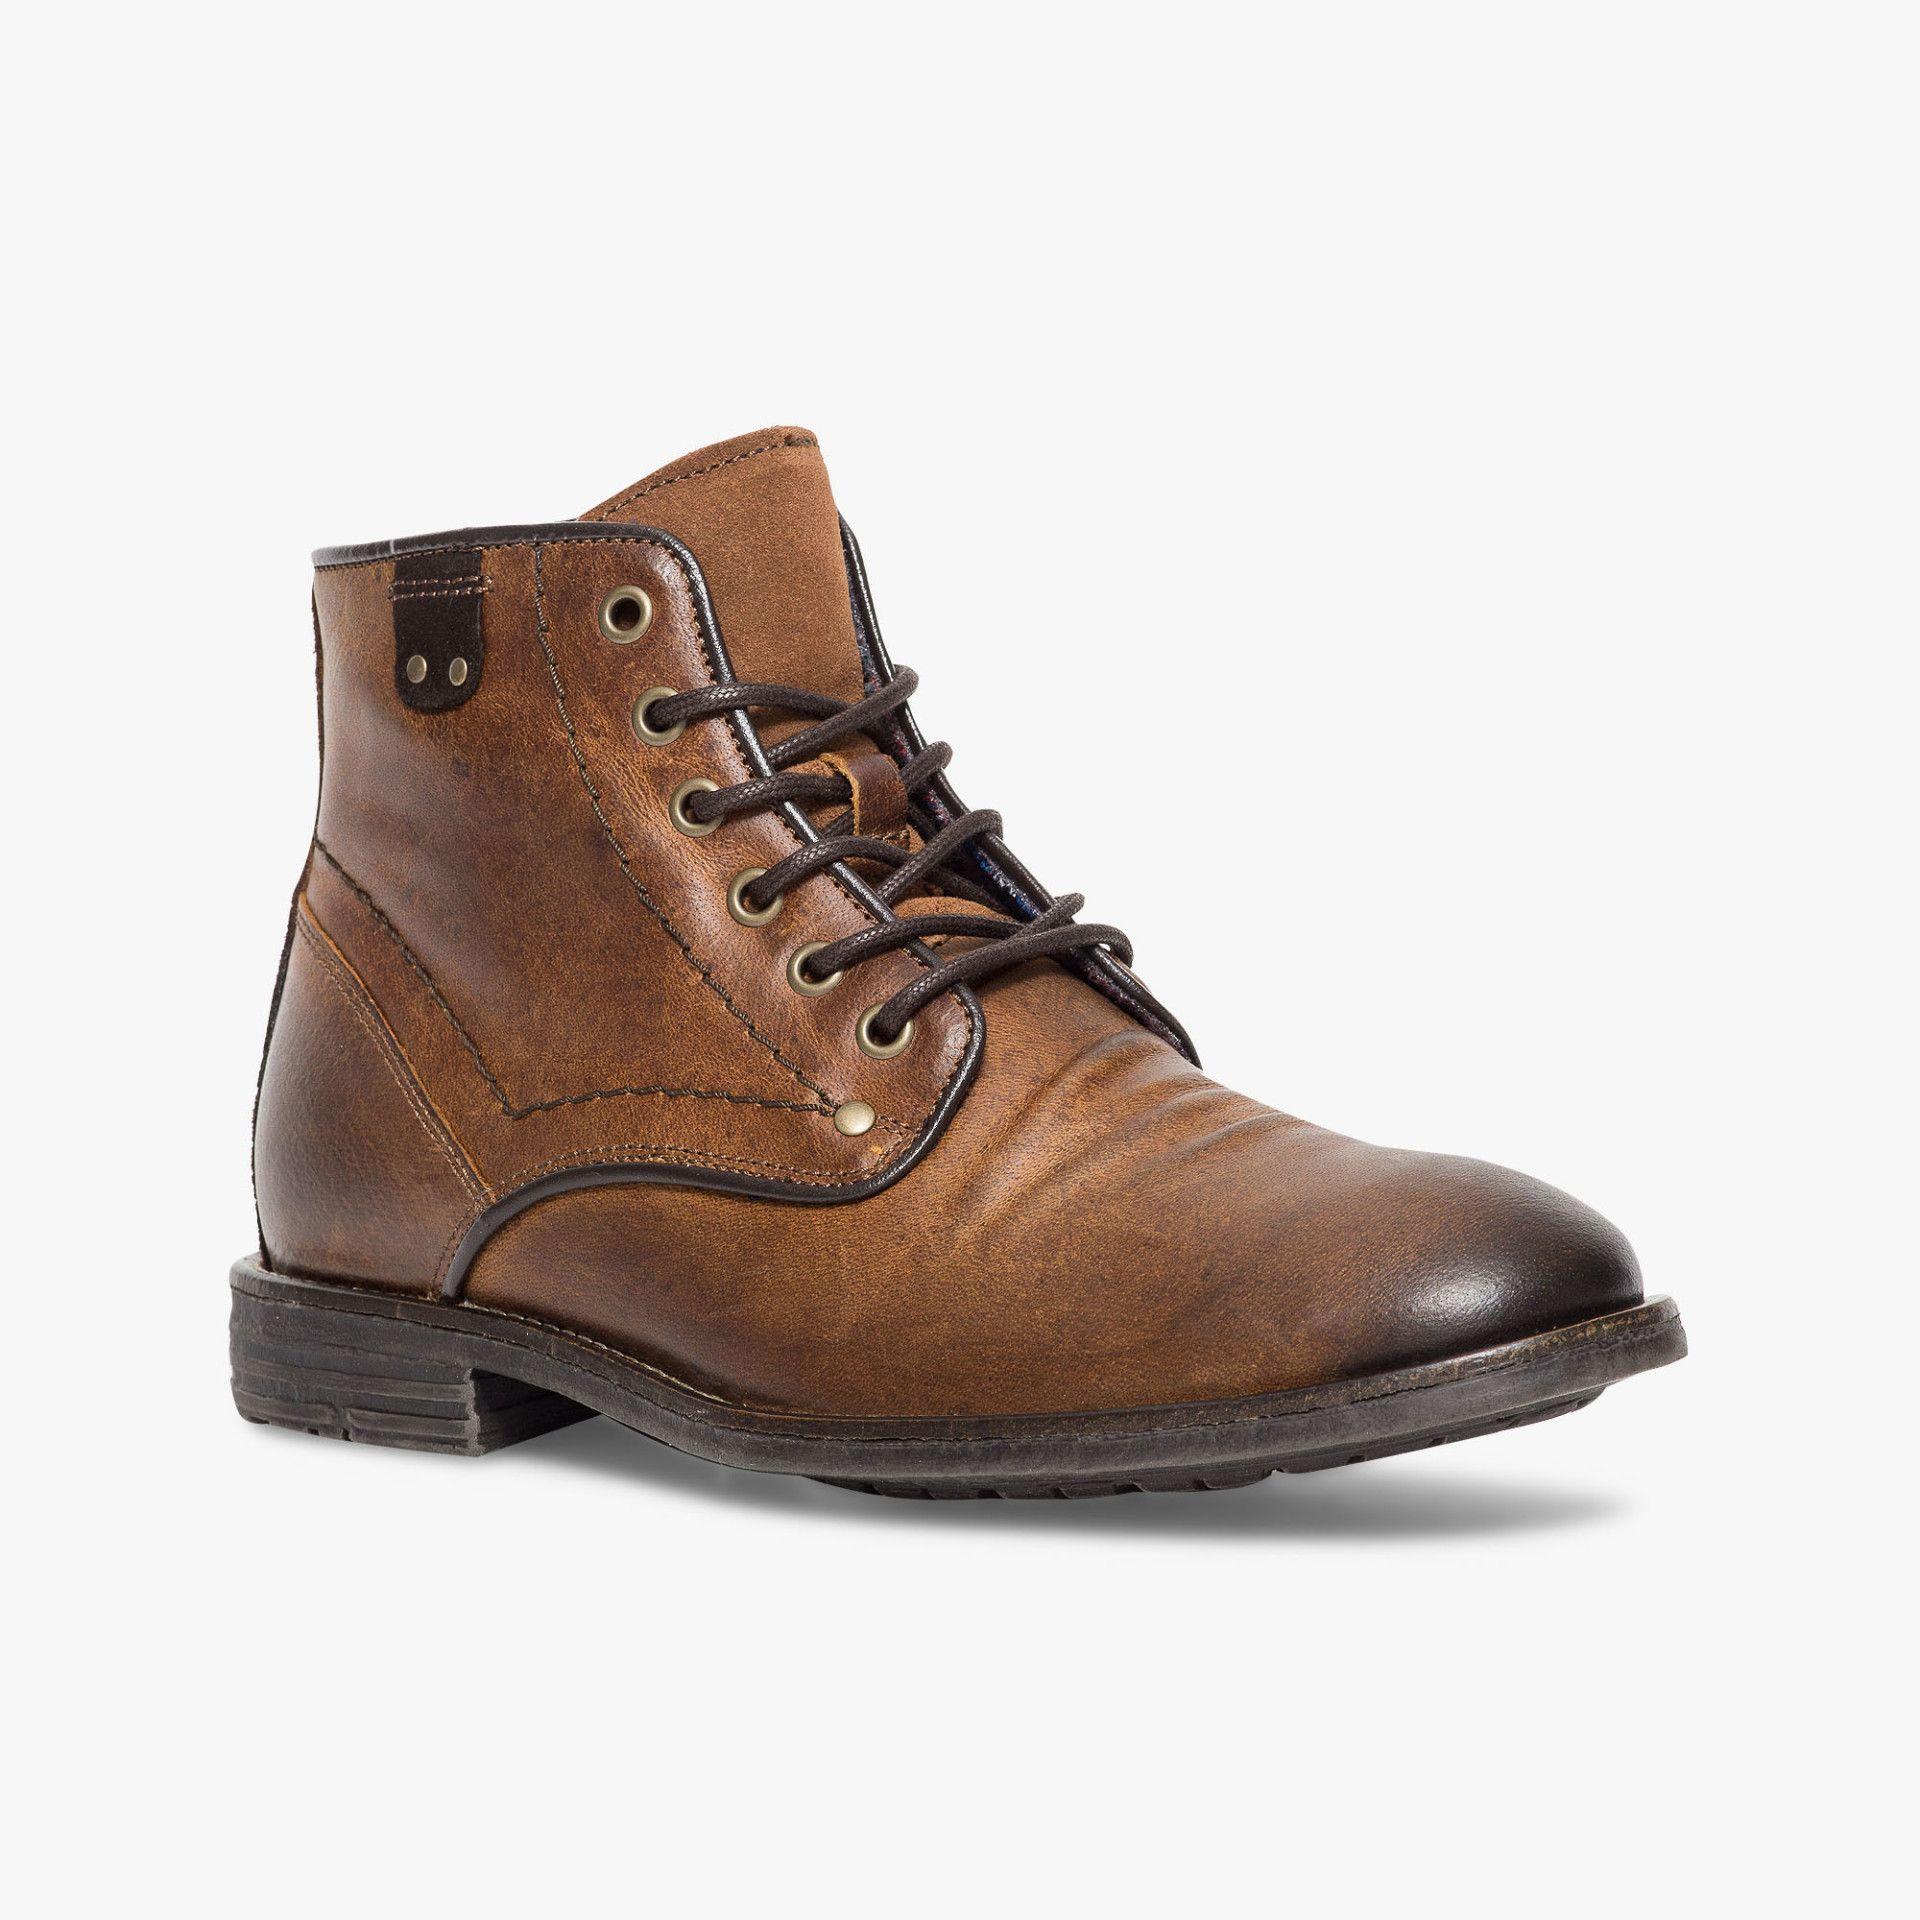 Raphael 2019Chaussure In En Boots Cuir Cognac BWrCedxo